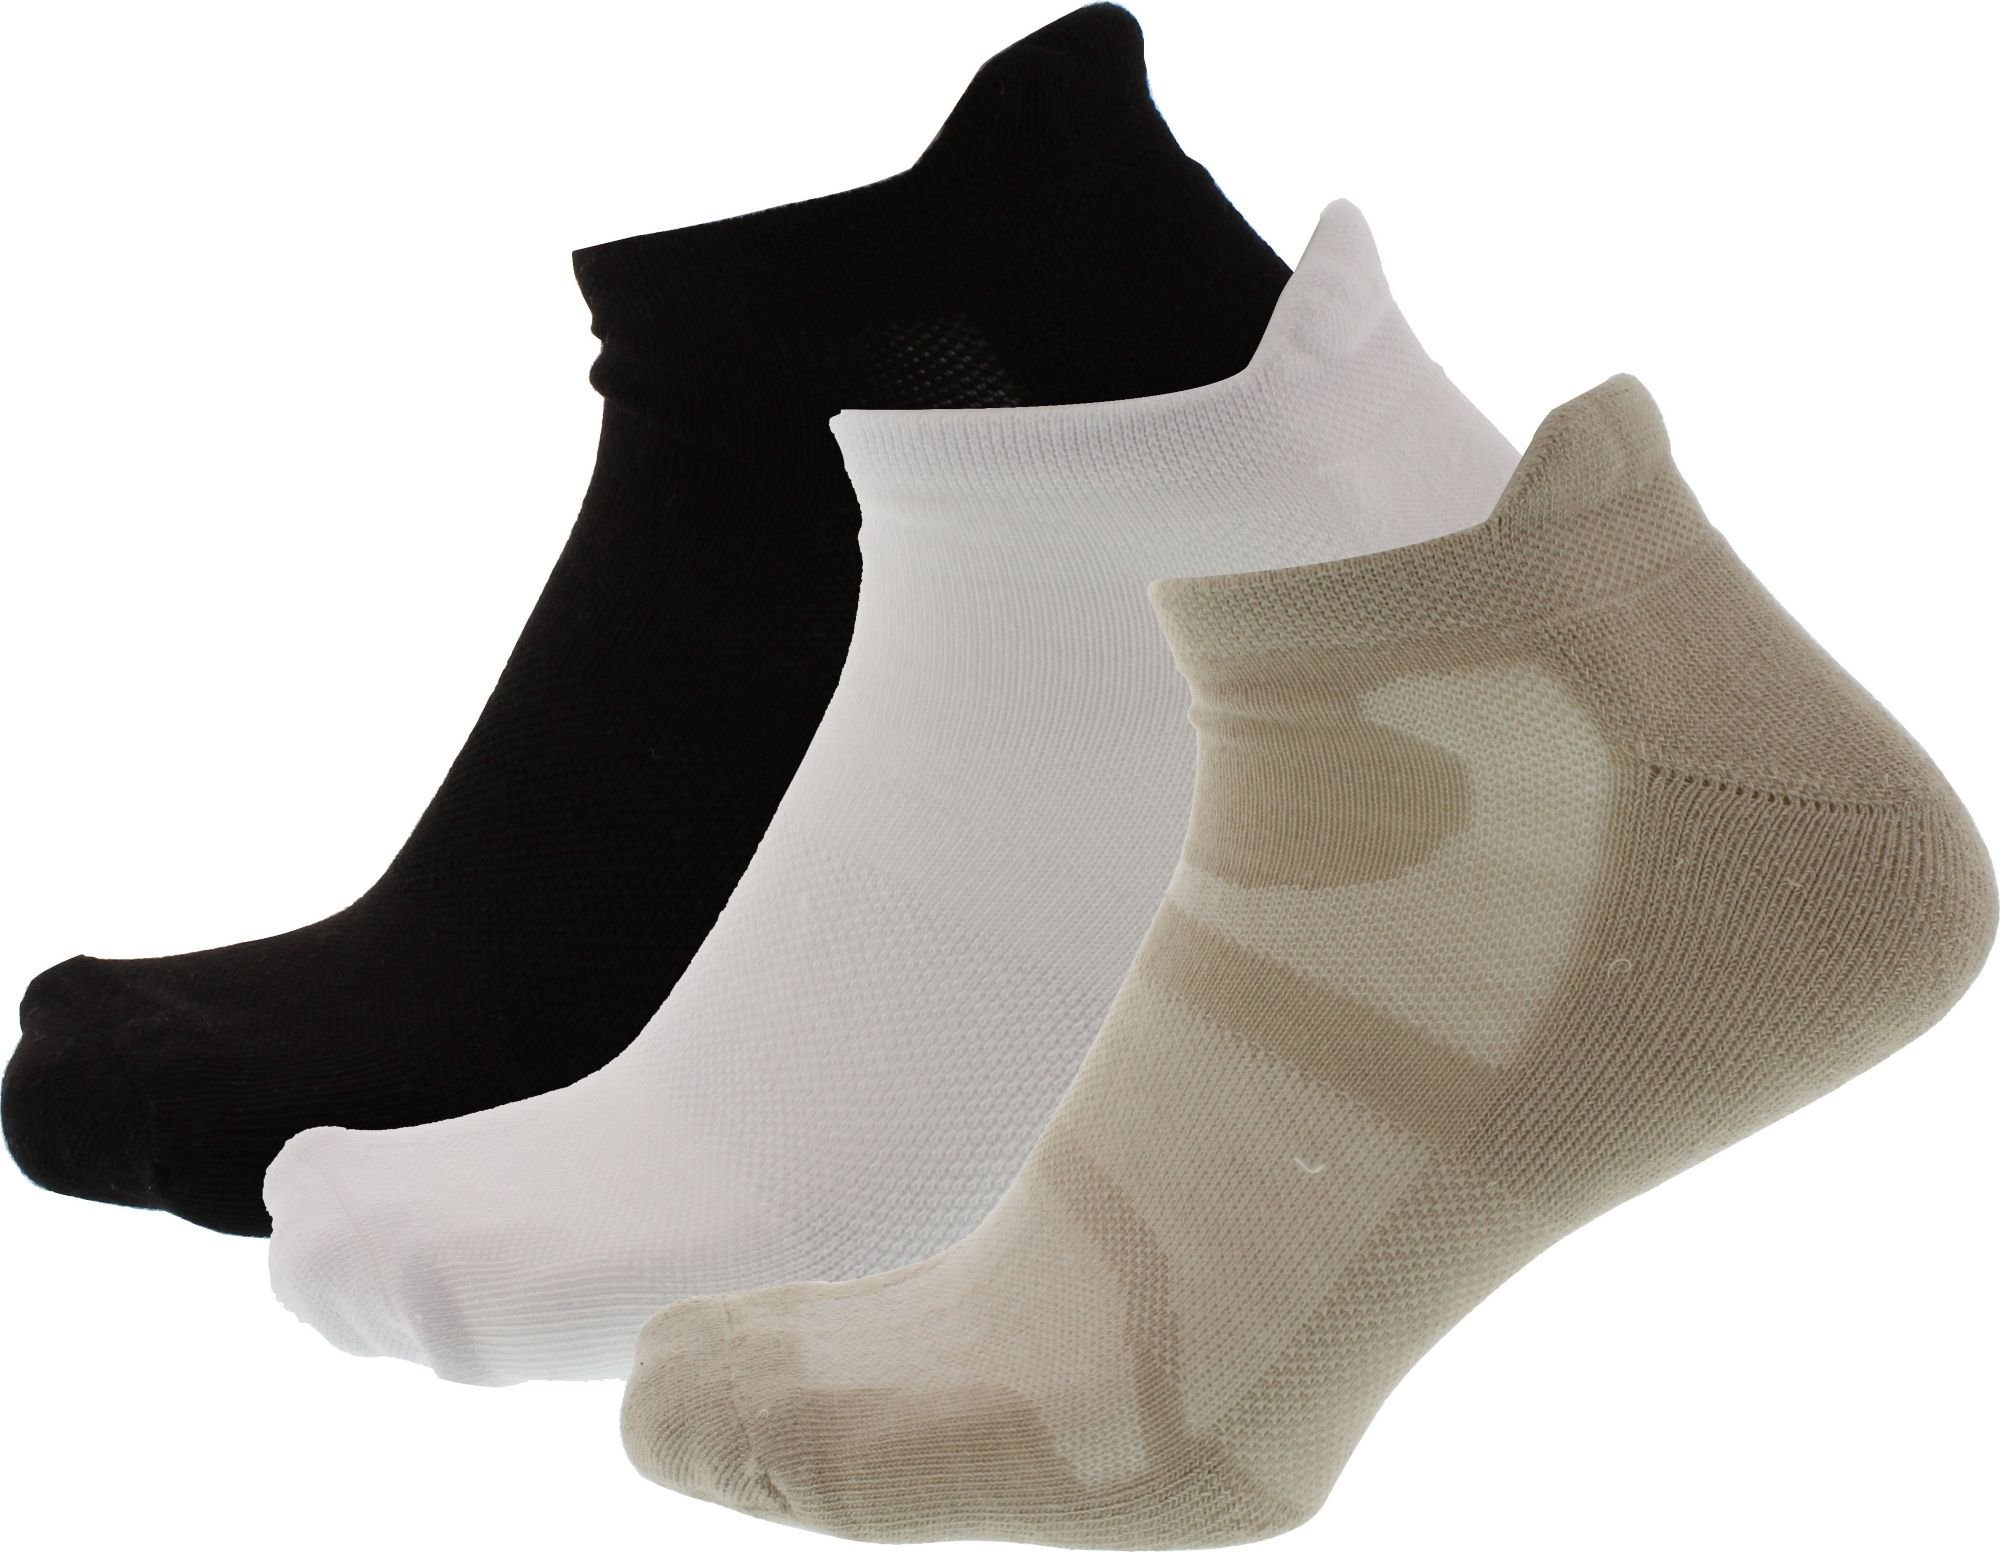 Walter Hagen Men's Sport Cut Tab Golf Socks 3 Pack - Black/White/Khaki, L